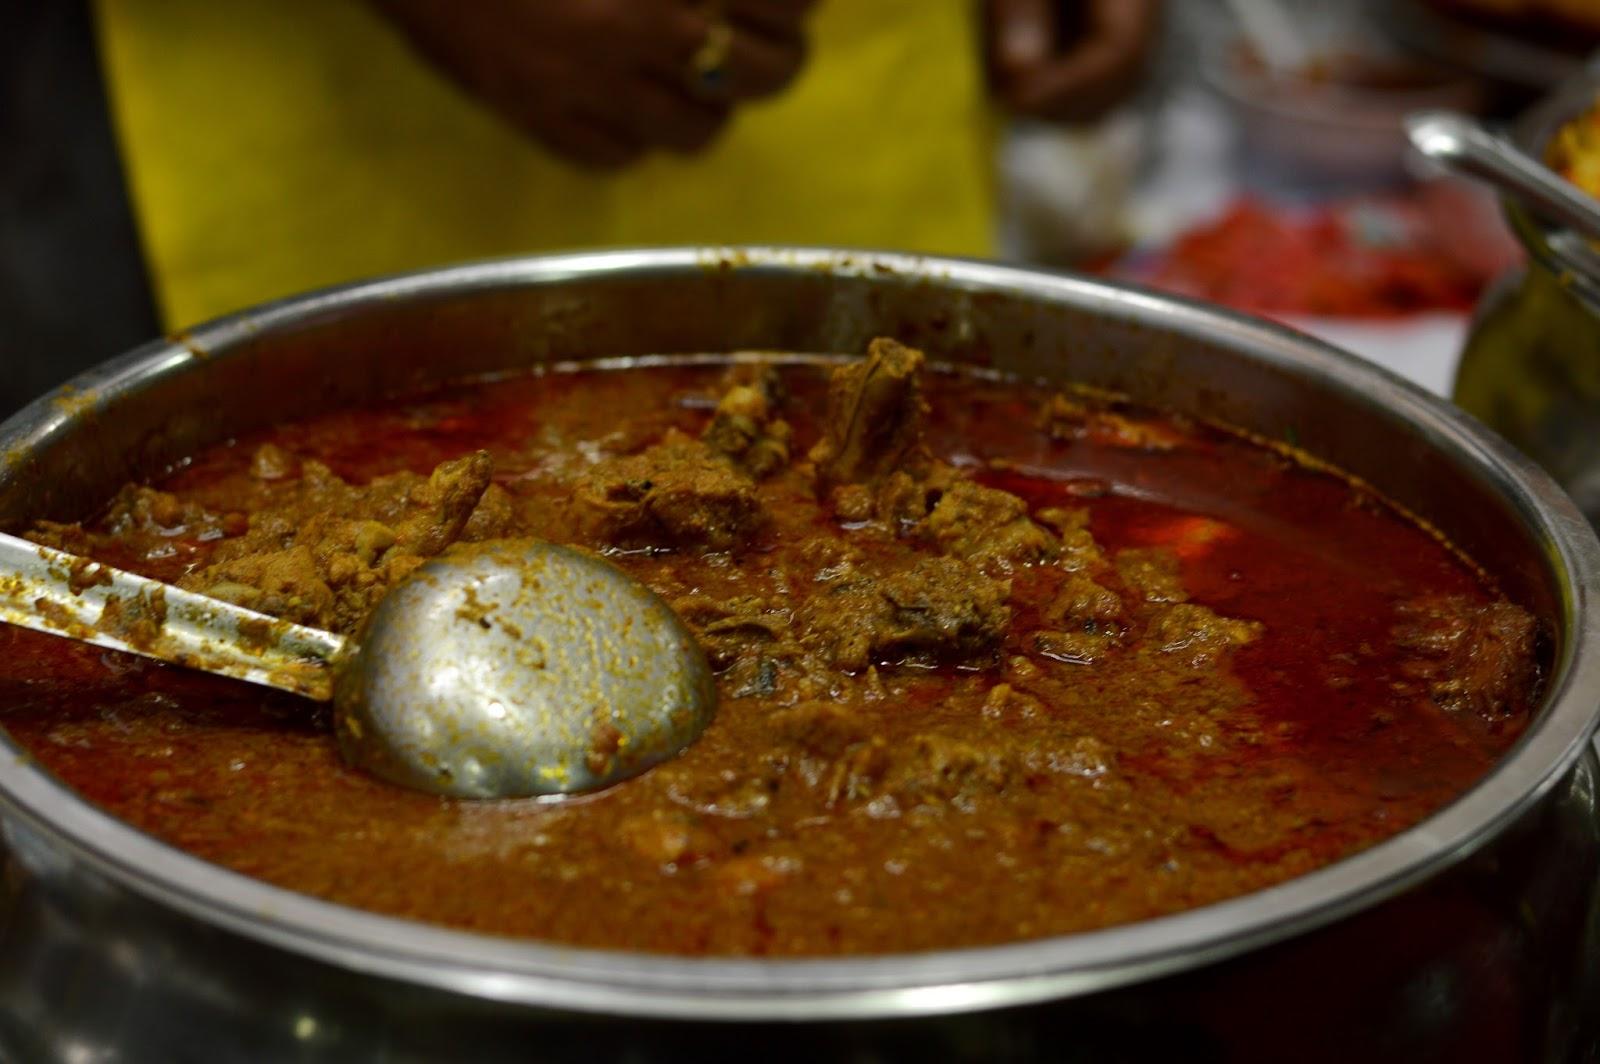 Ckp Food Festival In Thane